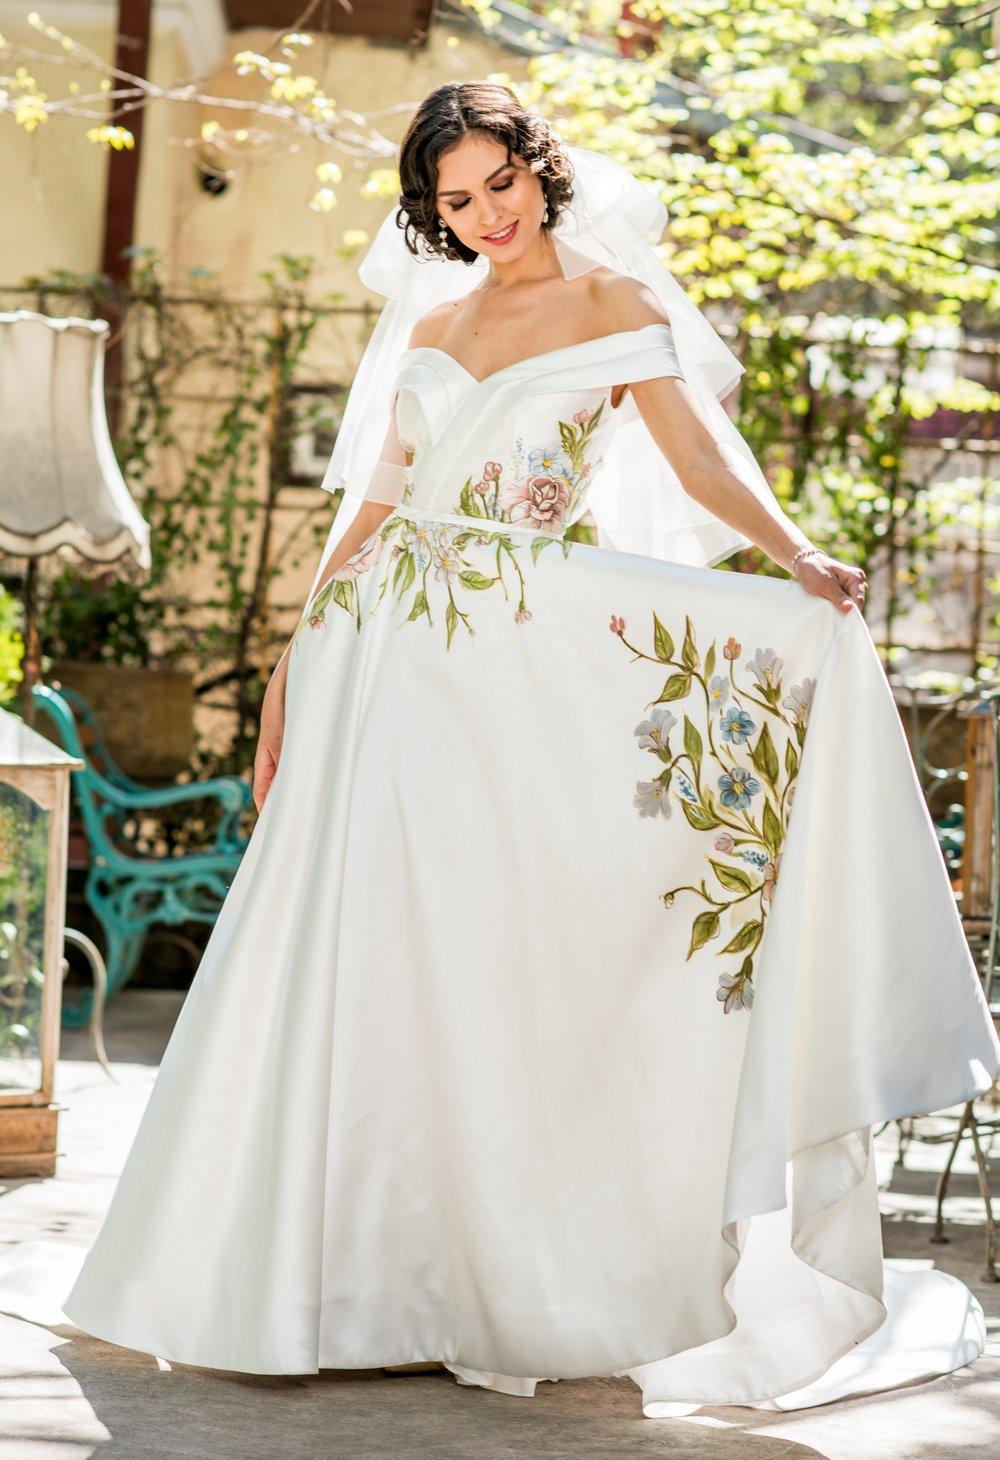 Wear Jardin, a hand-painted wedding dress